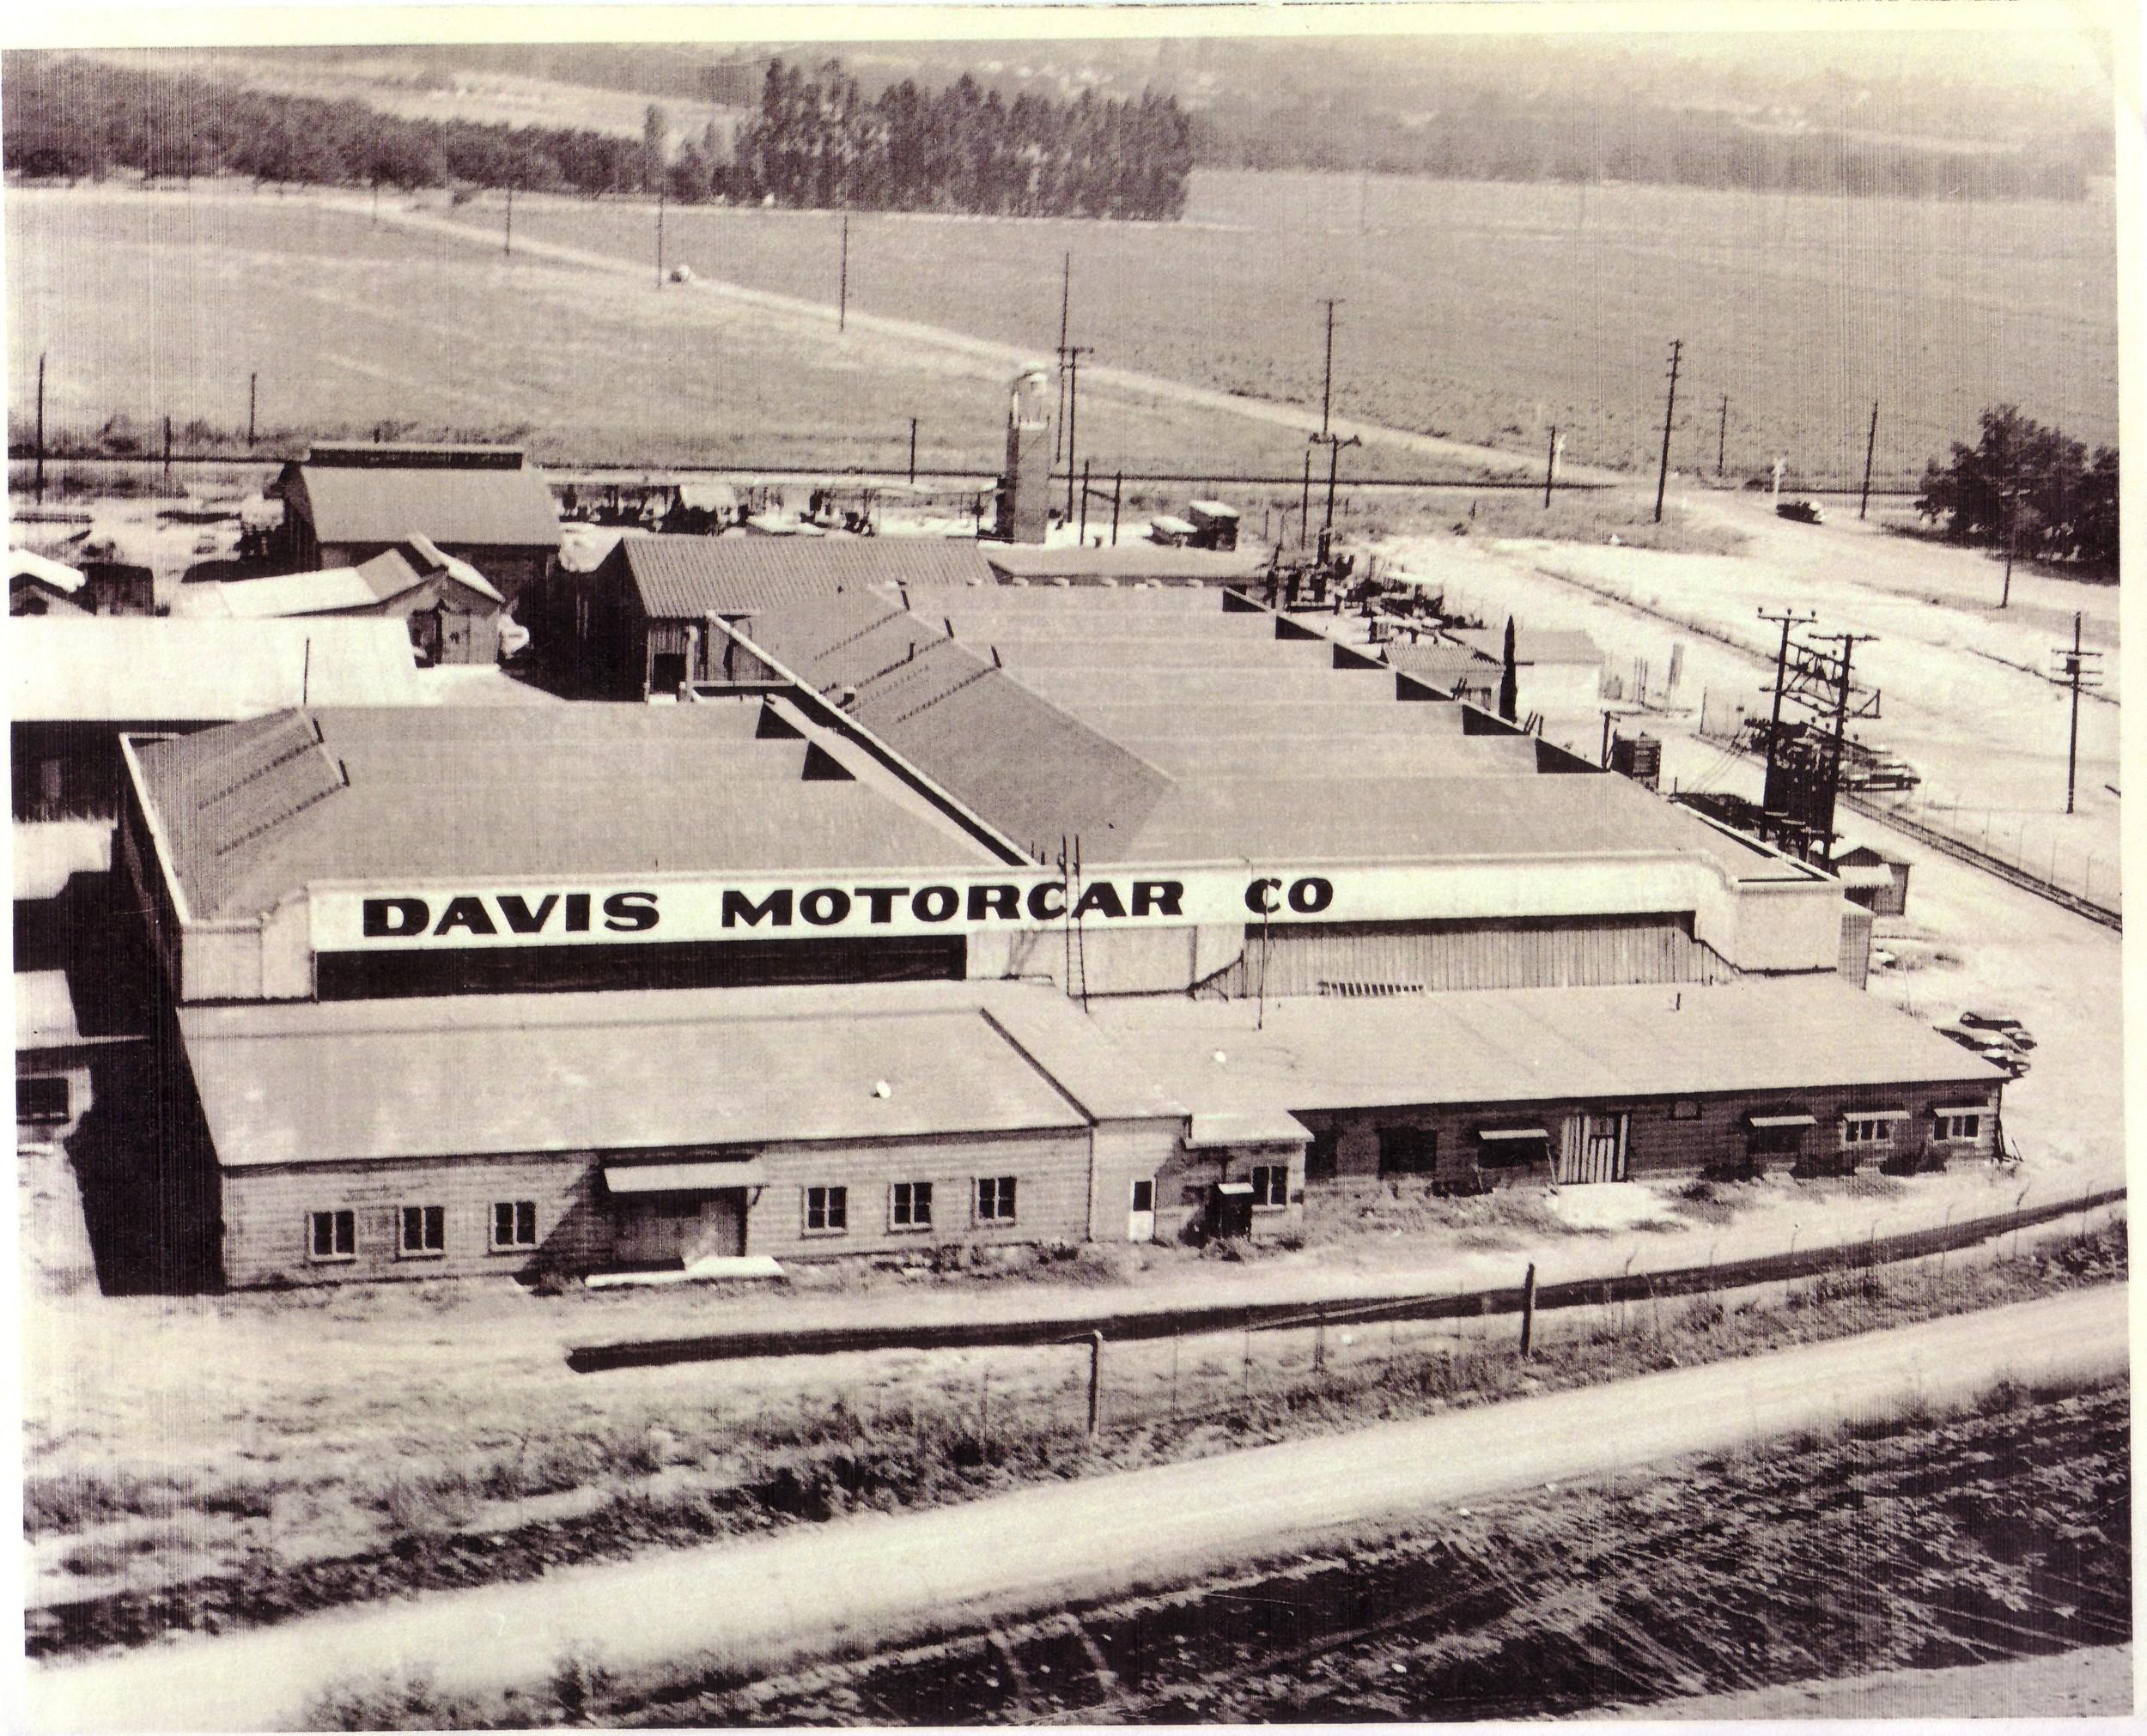 Davis.1948.factory aerial.jpg